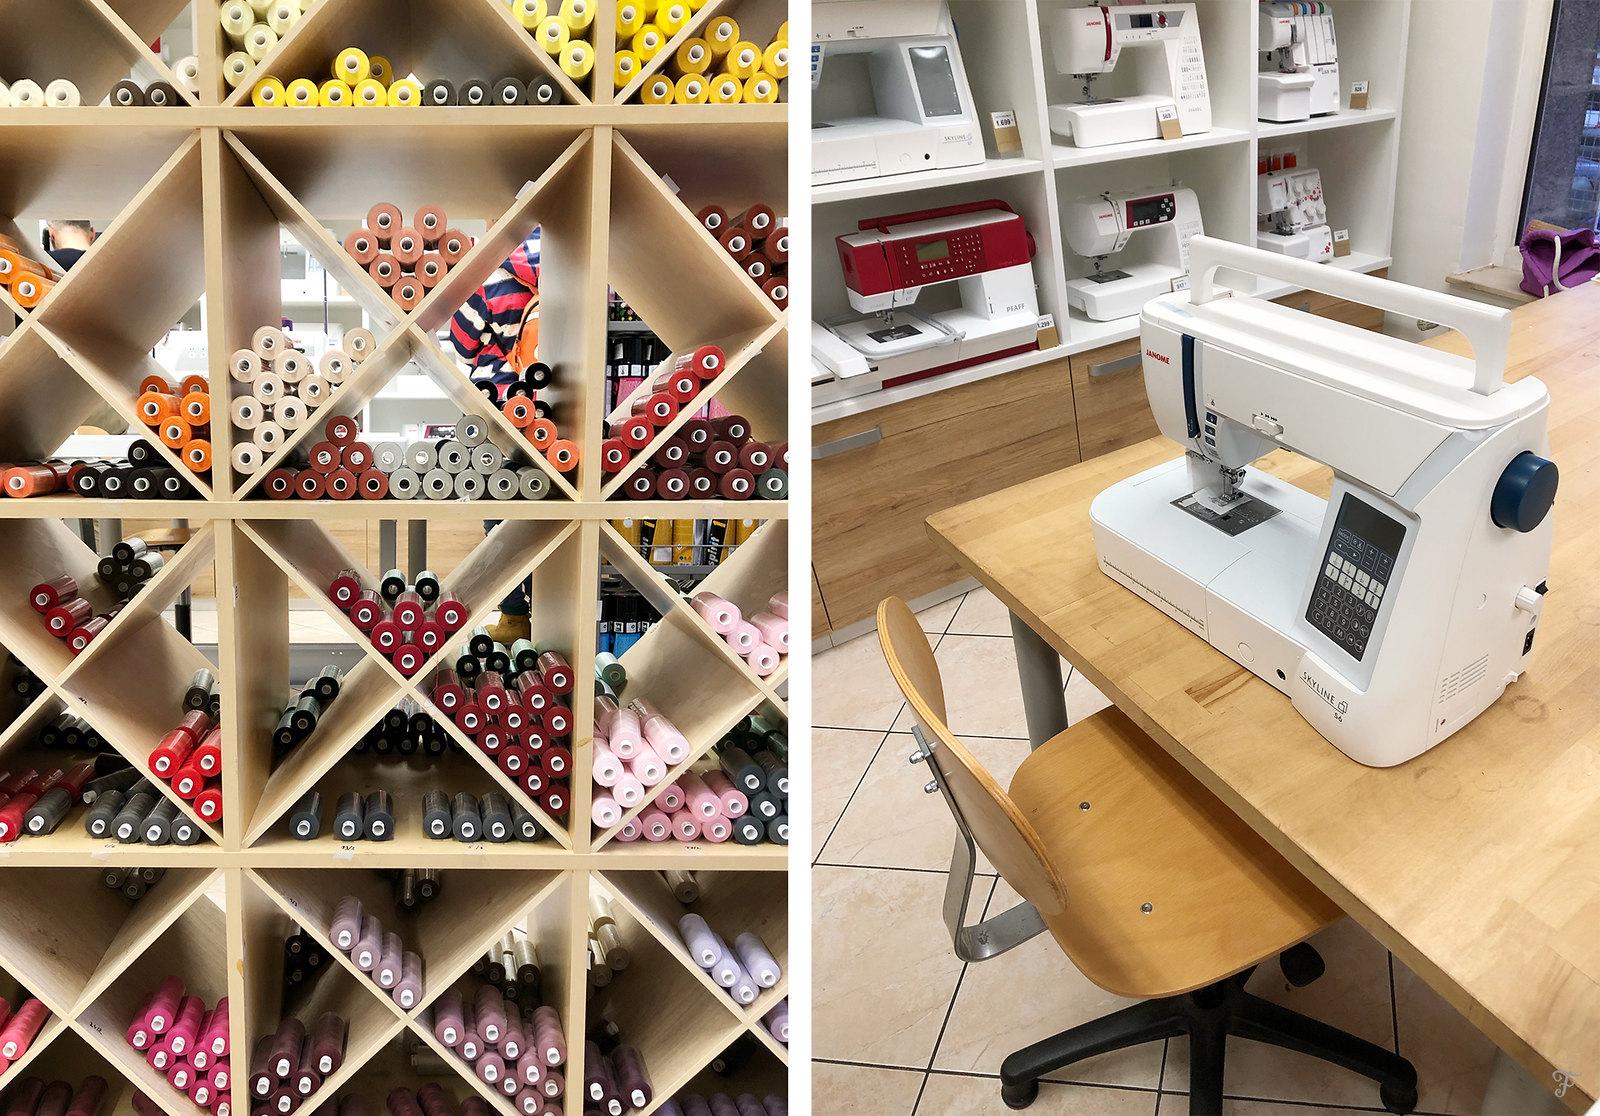 šivalna tehnika fensišmensi blog texi janome sewing machine šivalni stroj